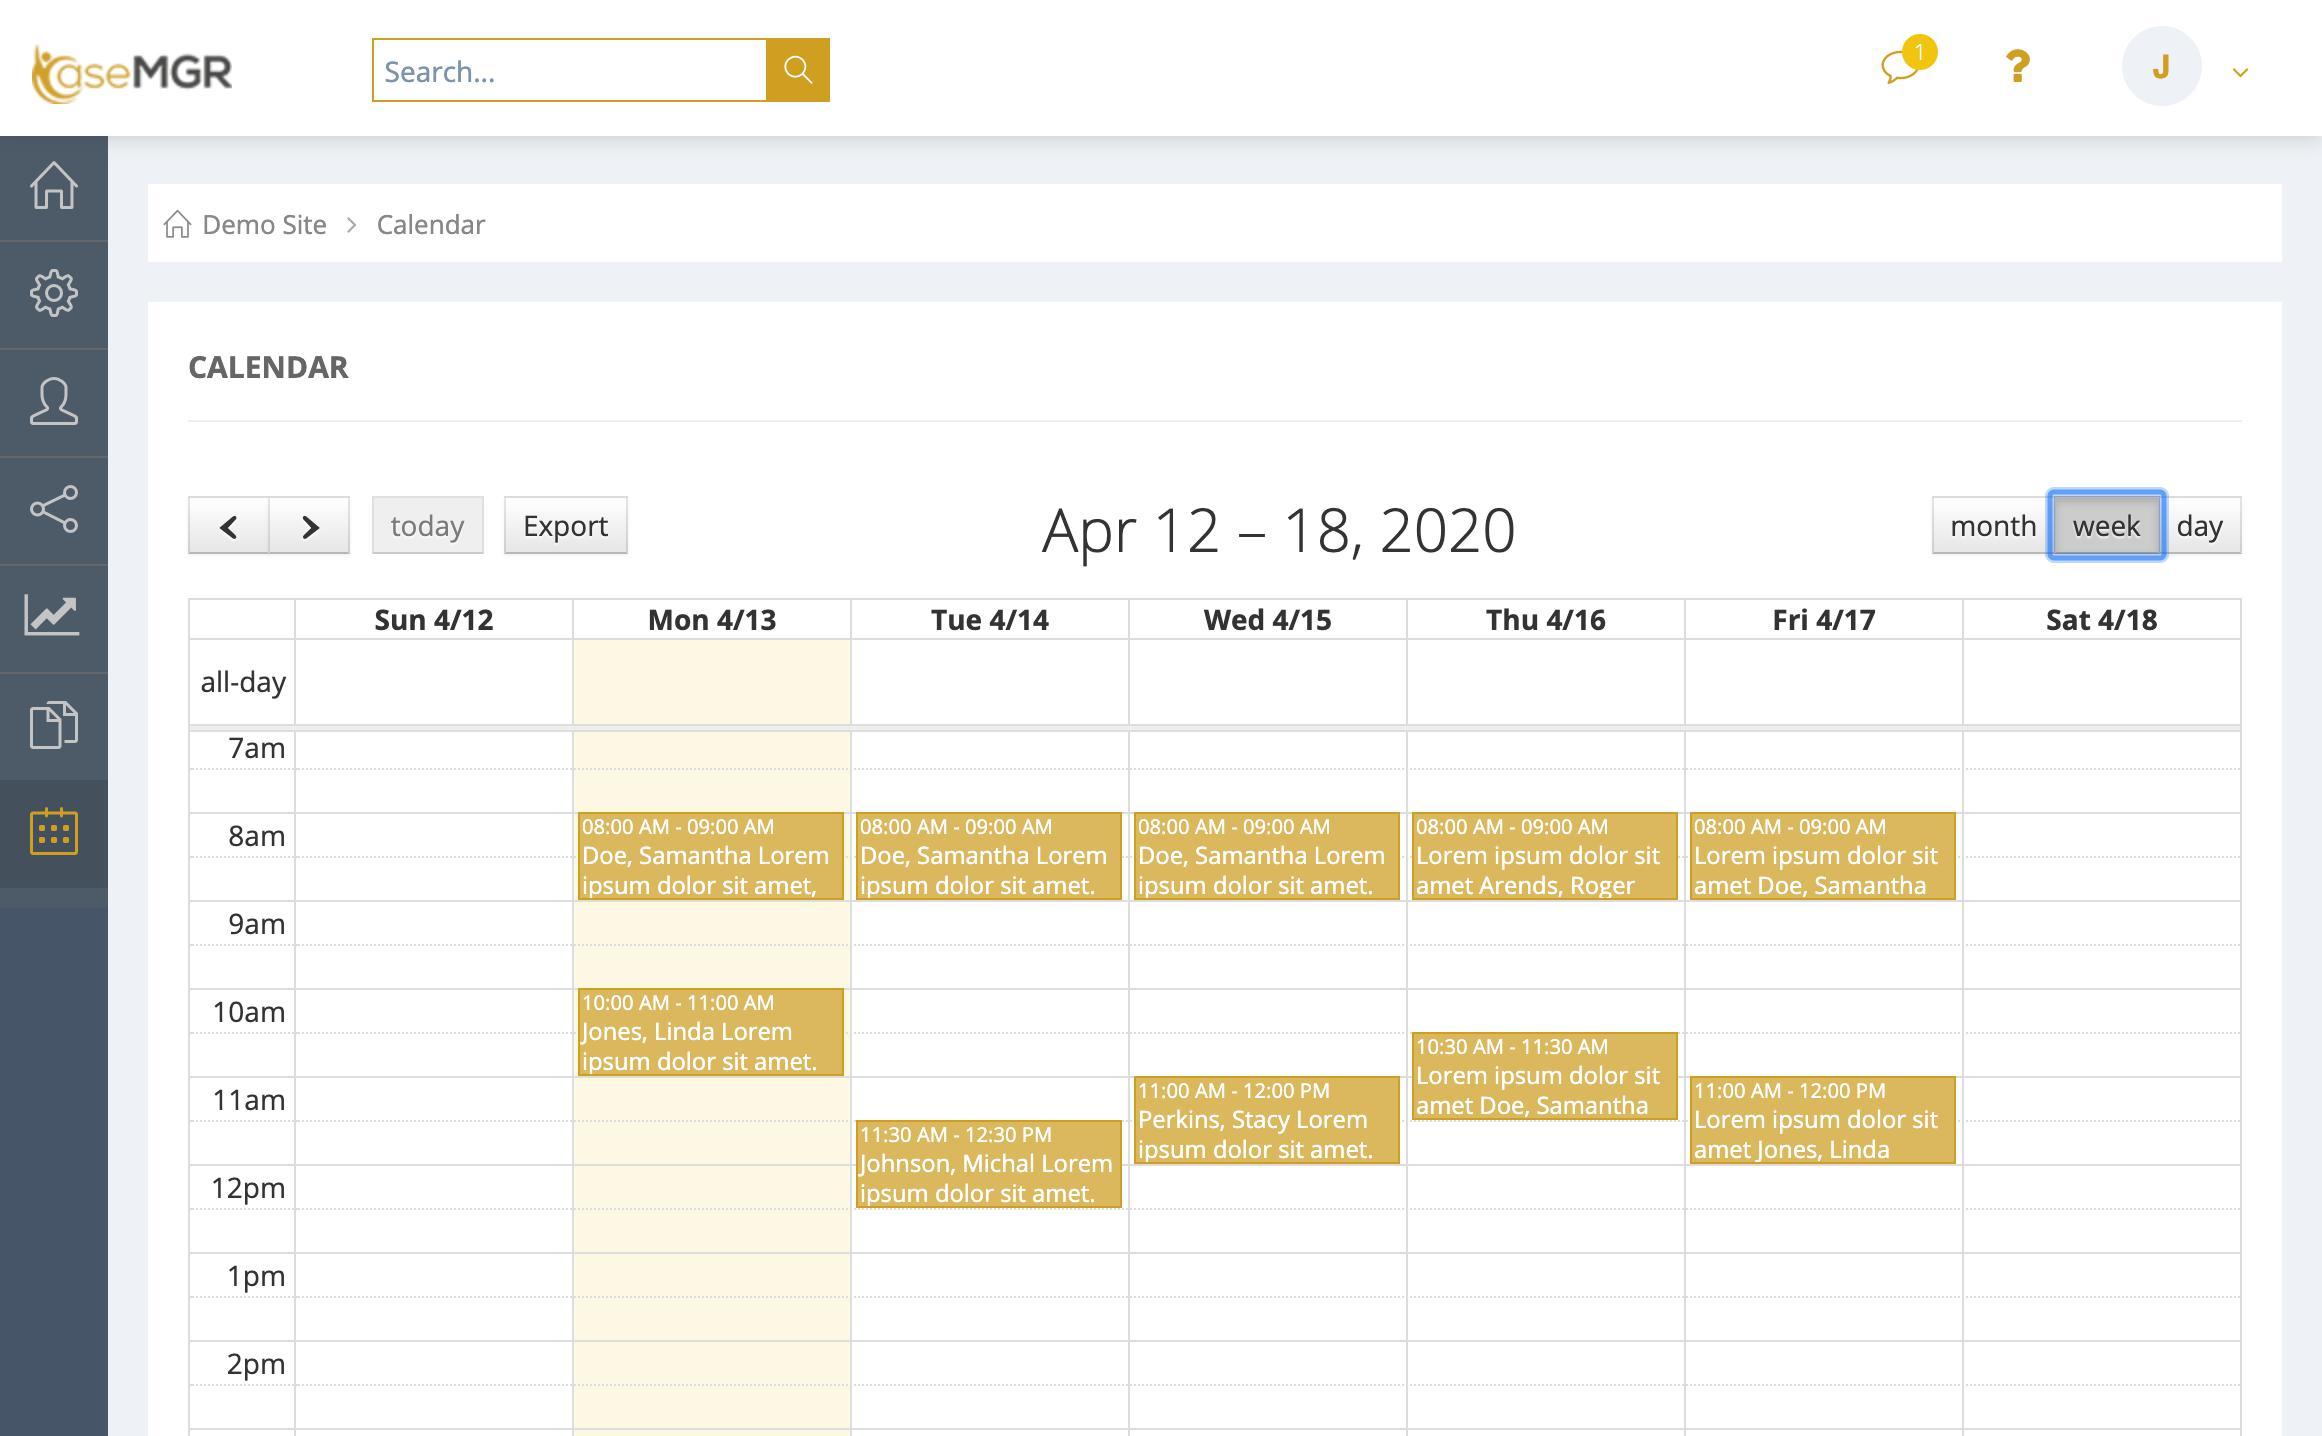 Schedule screen shot from CaseMGR